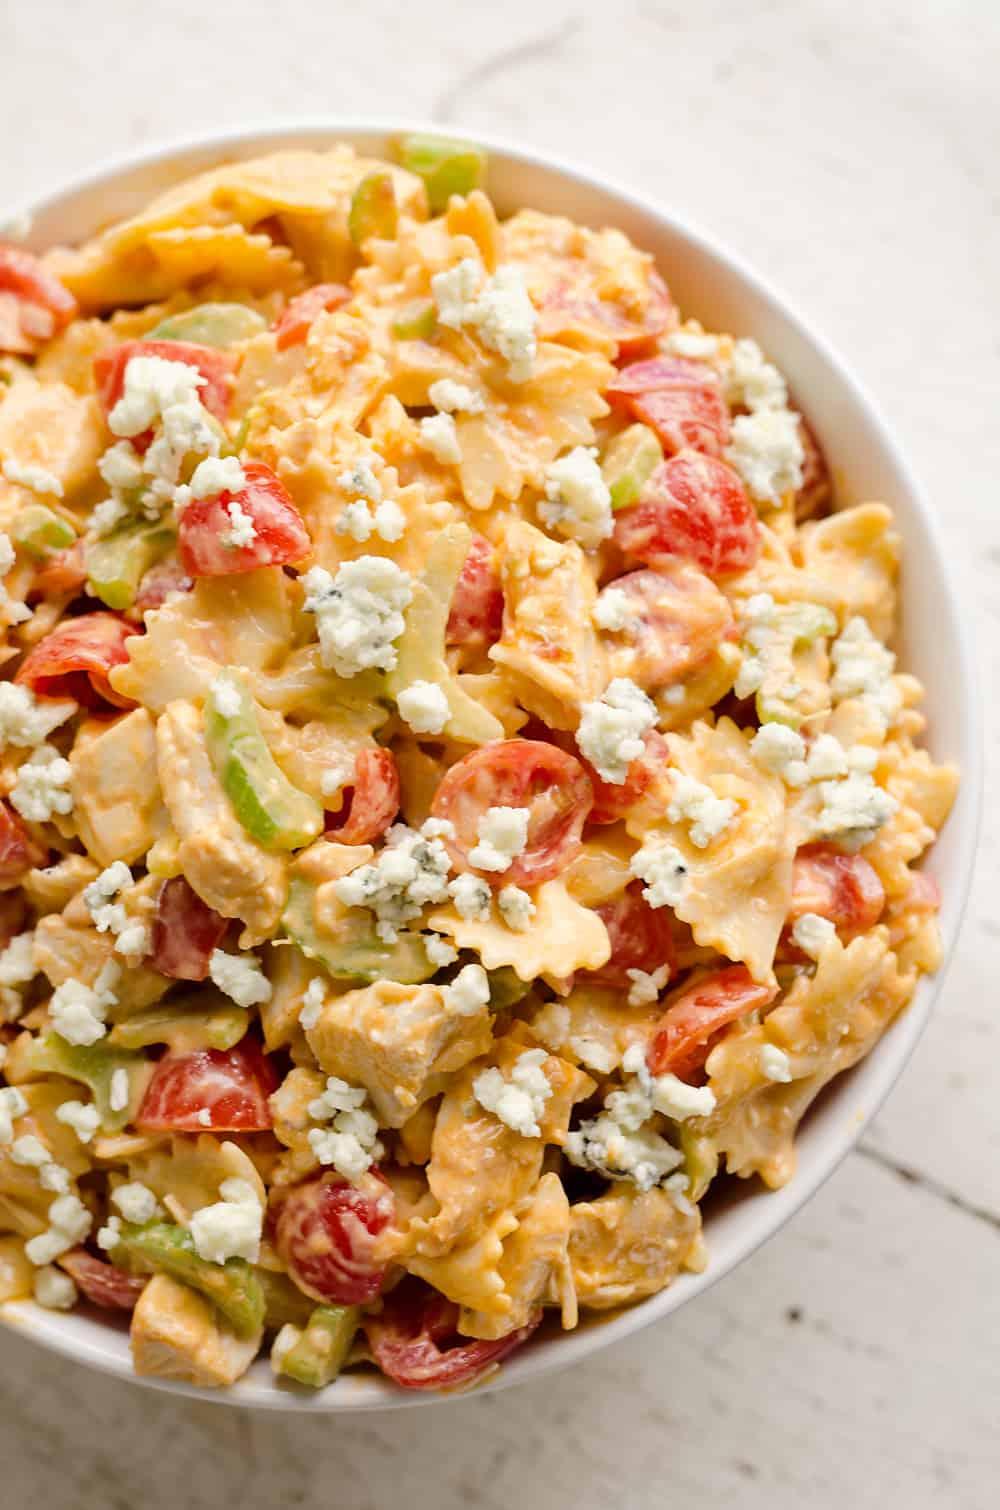 leftover-chicken-recipes-Buffalo-Ranch-Chicken-Pasta-Salad-The-Creative-Bite